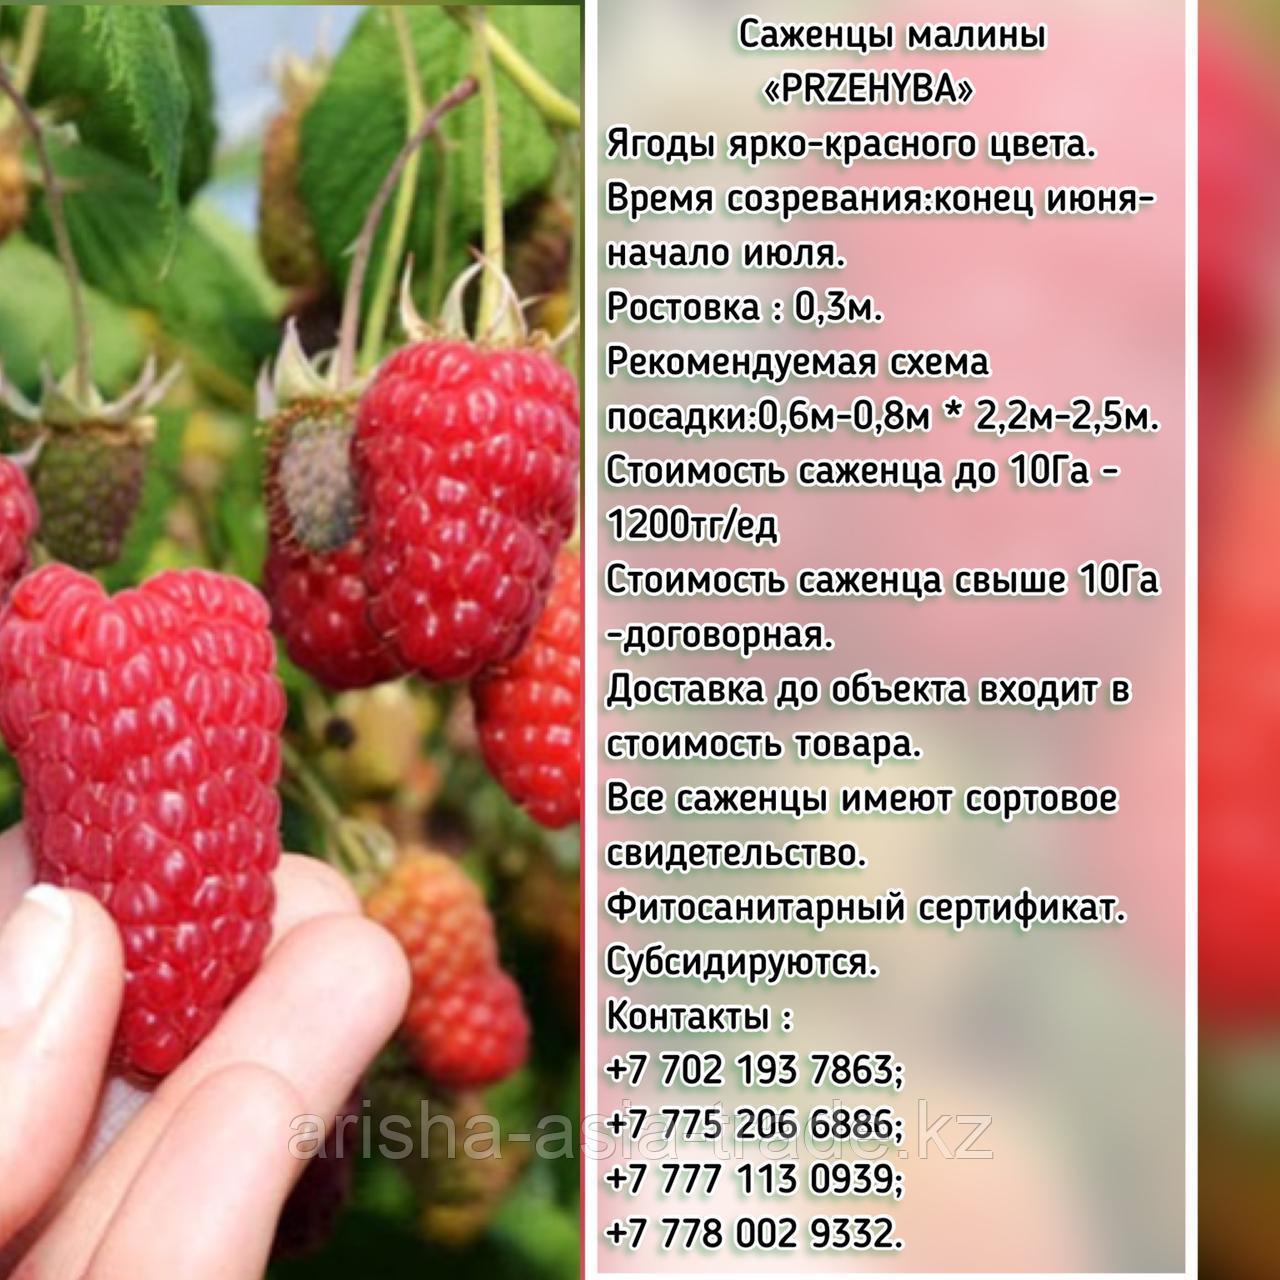 "Саженцы малины ""Przehyba"" (Пшехиба) Сербия"